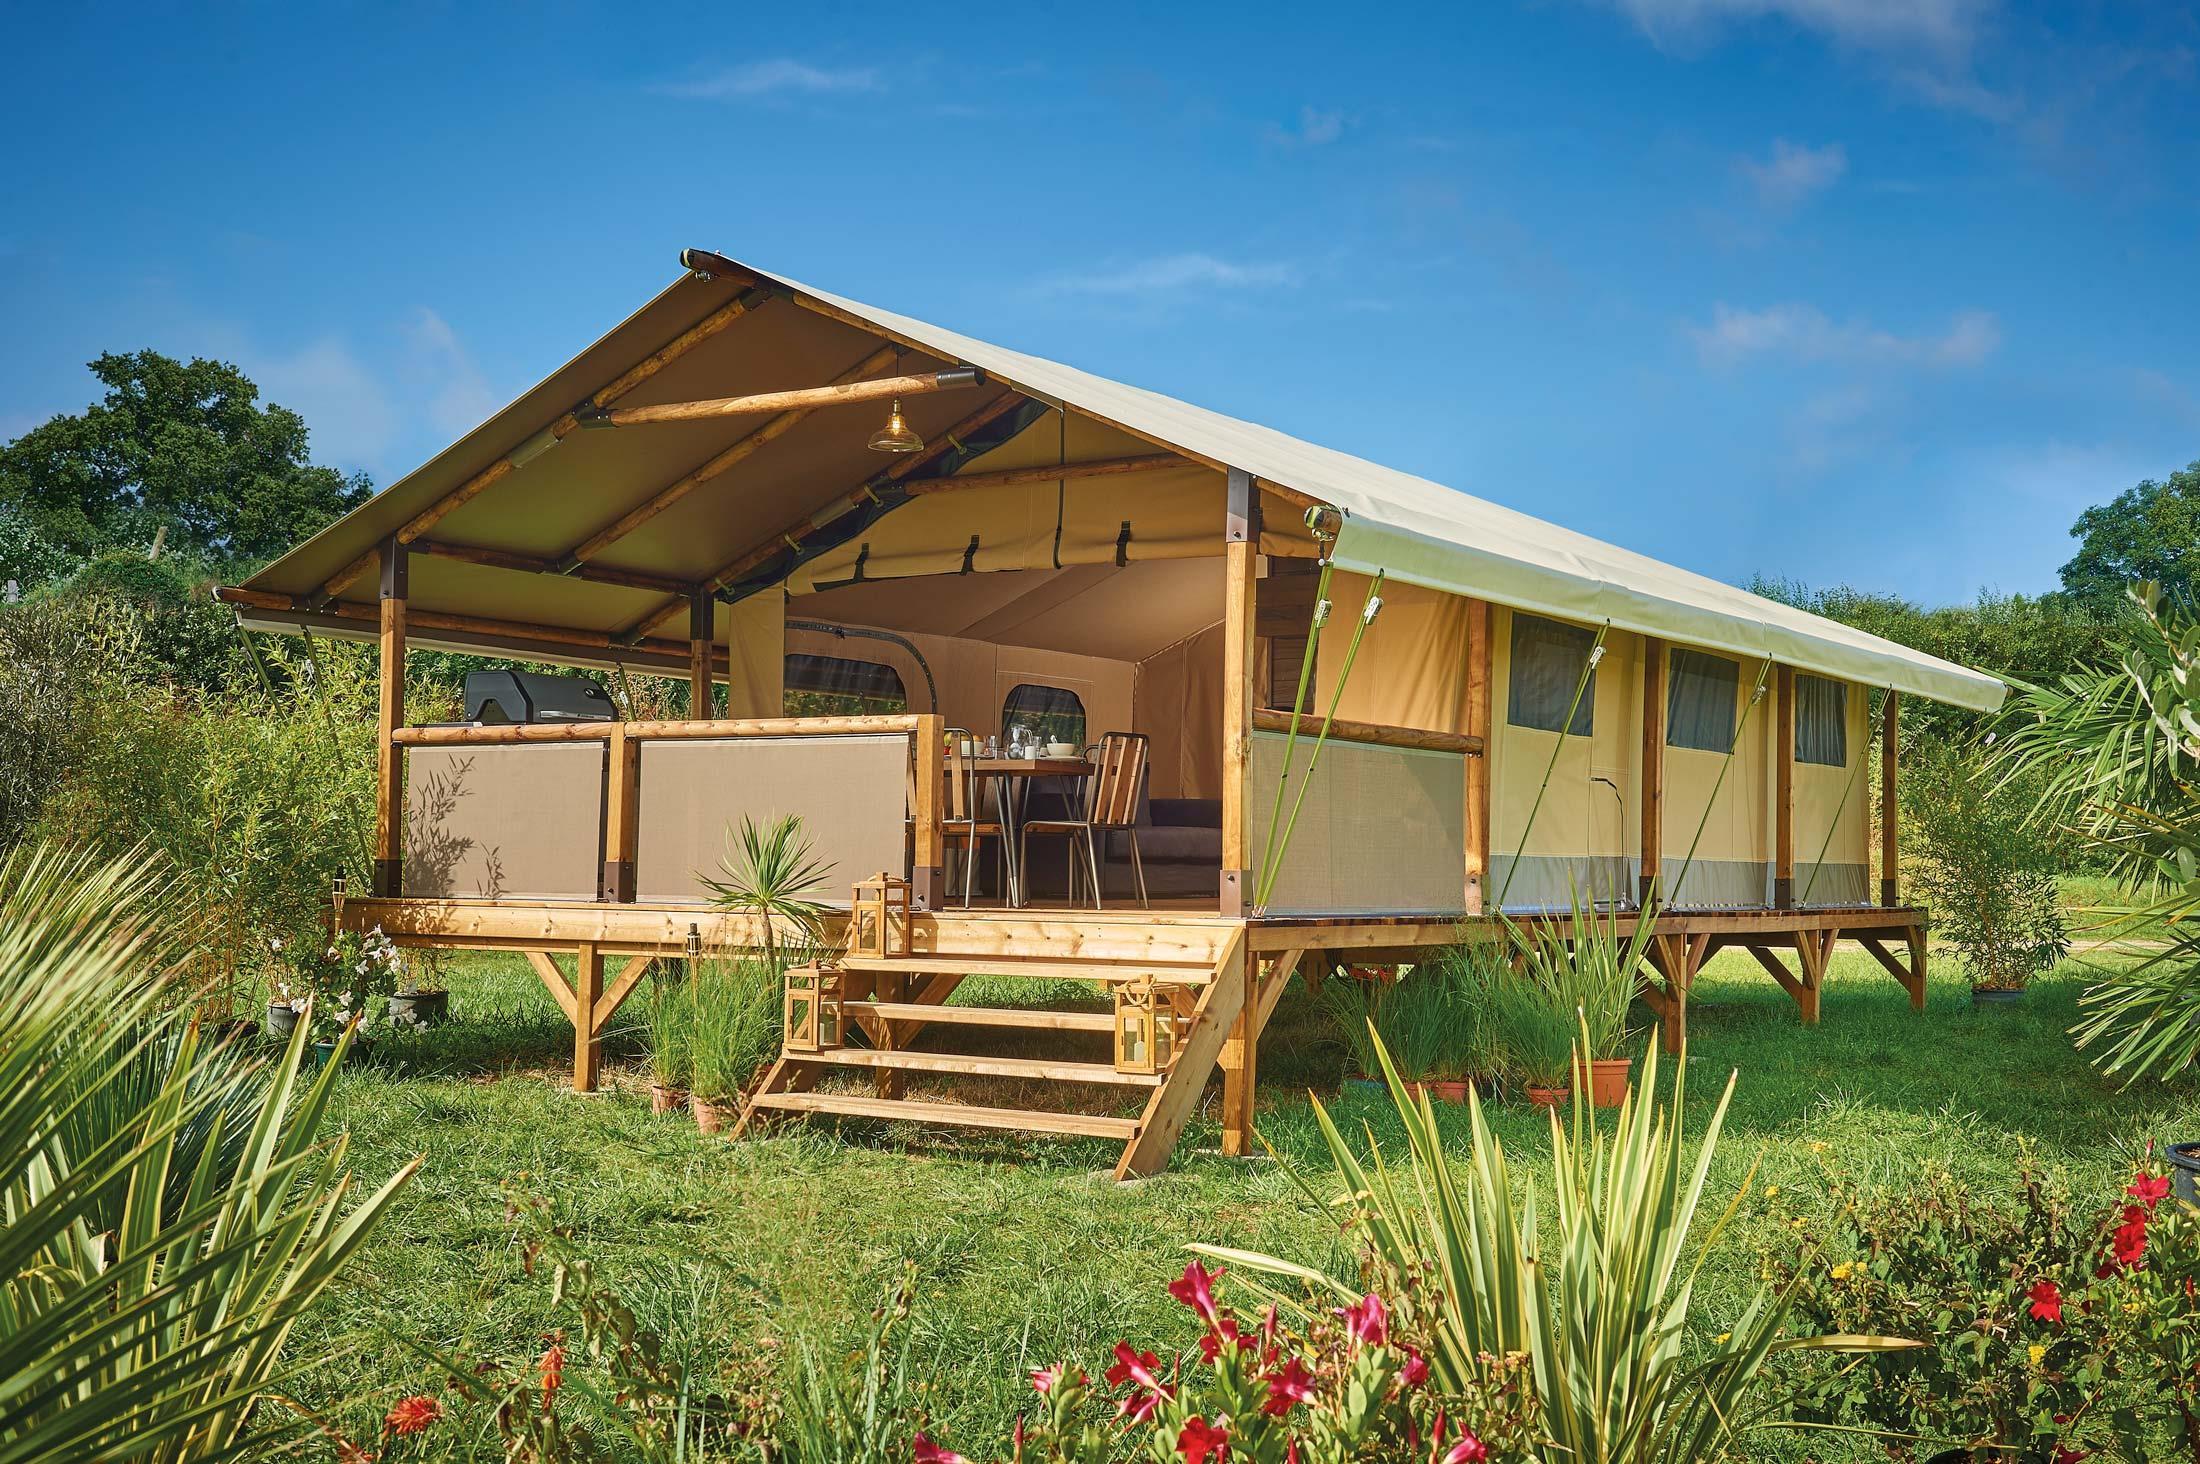 Location - Confort Tente Lodge Vintage 34.50M² (2 Chambres) + Terrasse - Sans Sanitaires - 2019 - Flower Camping Verte Vallee